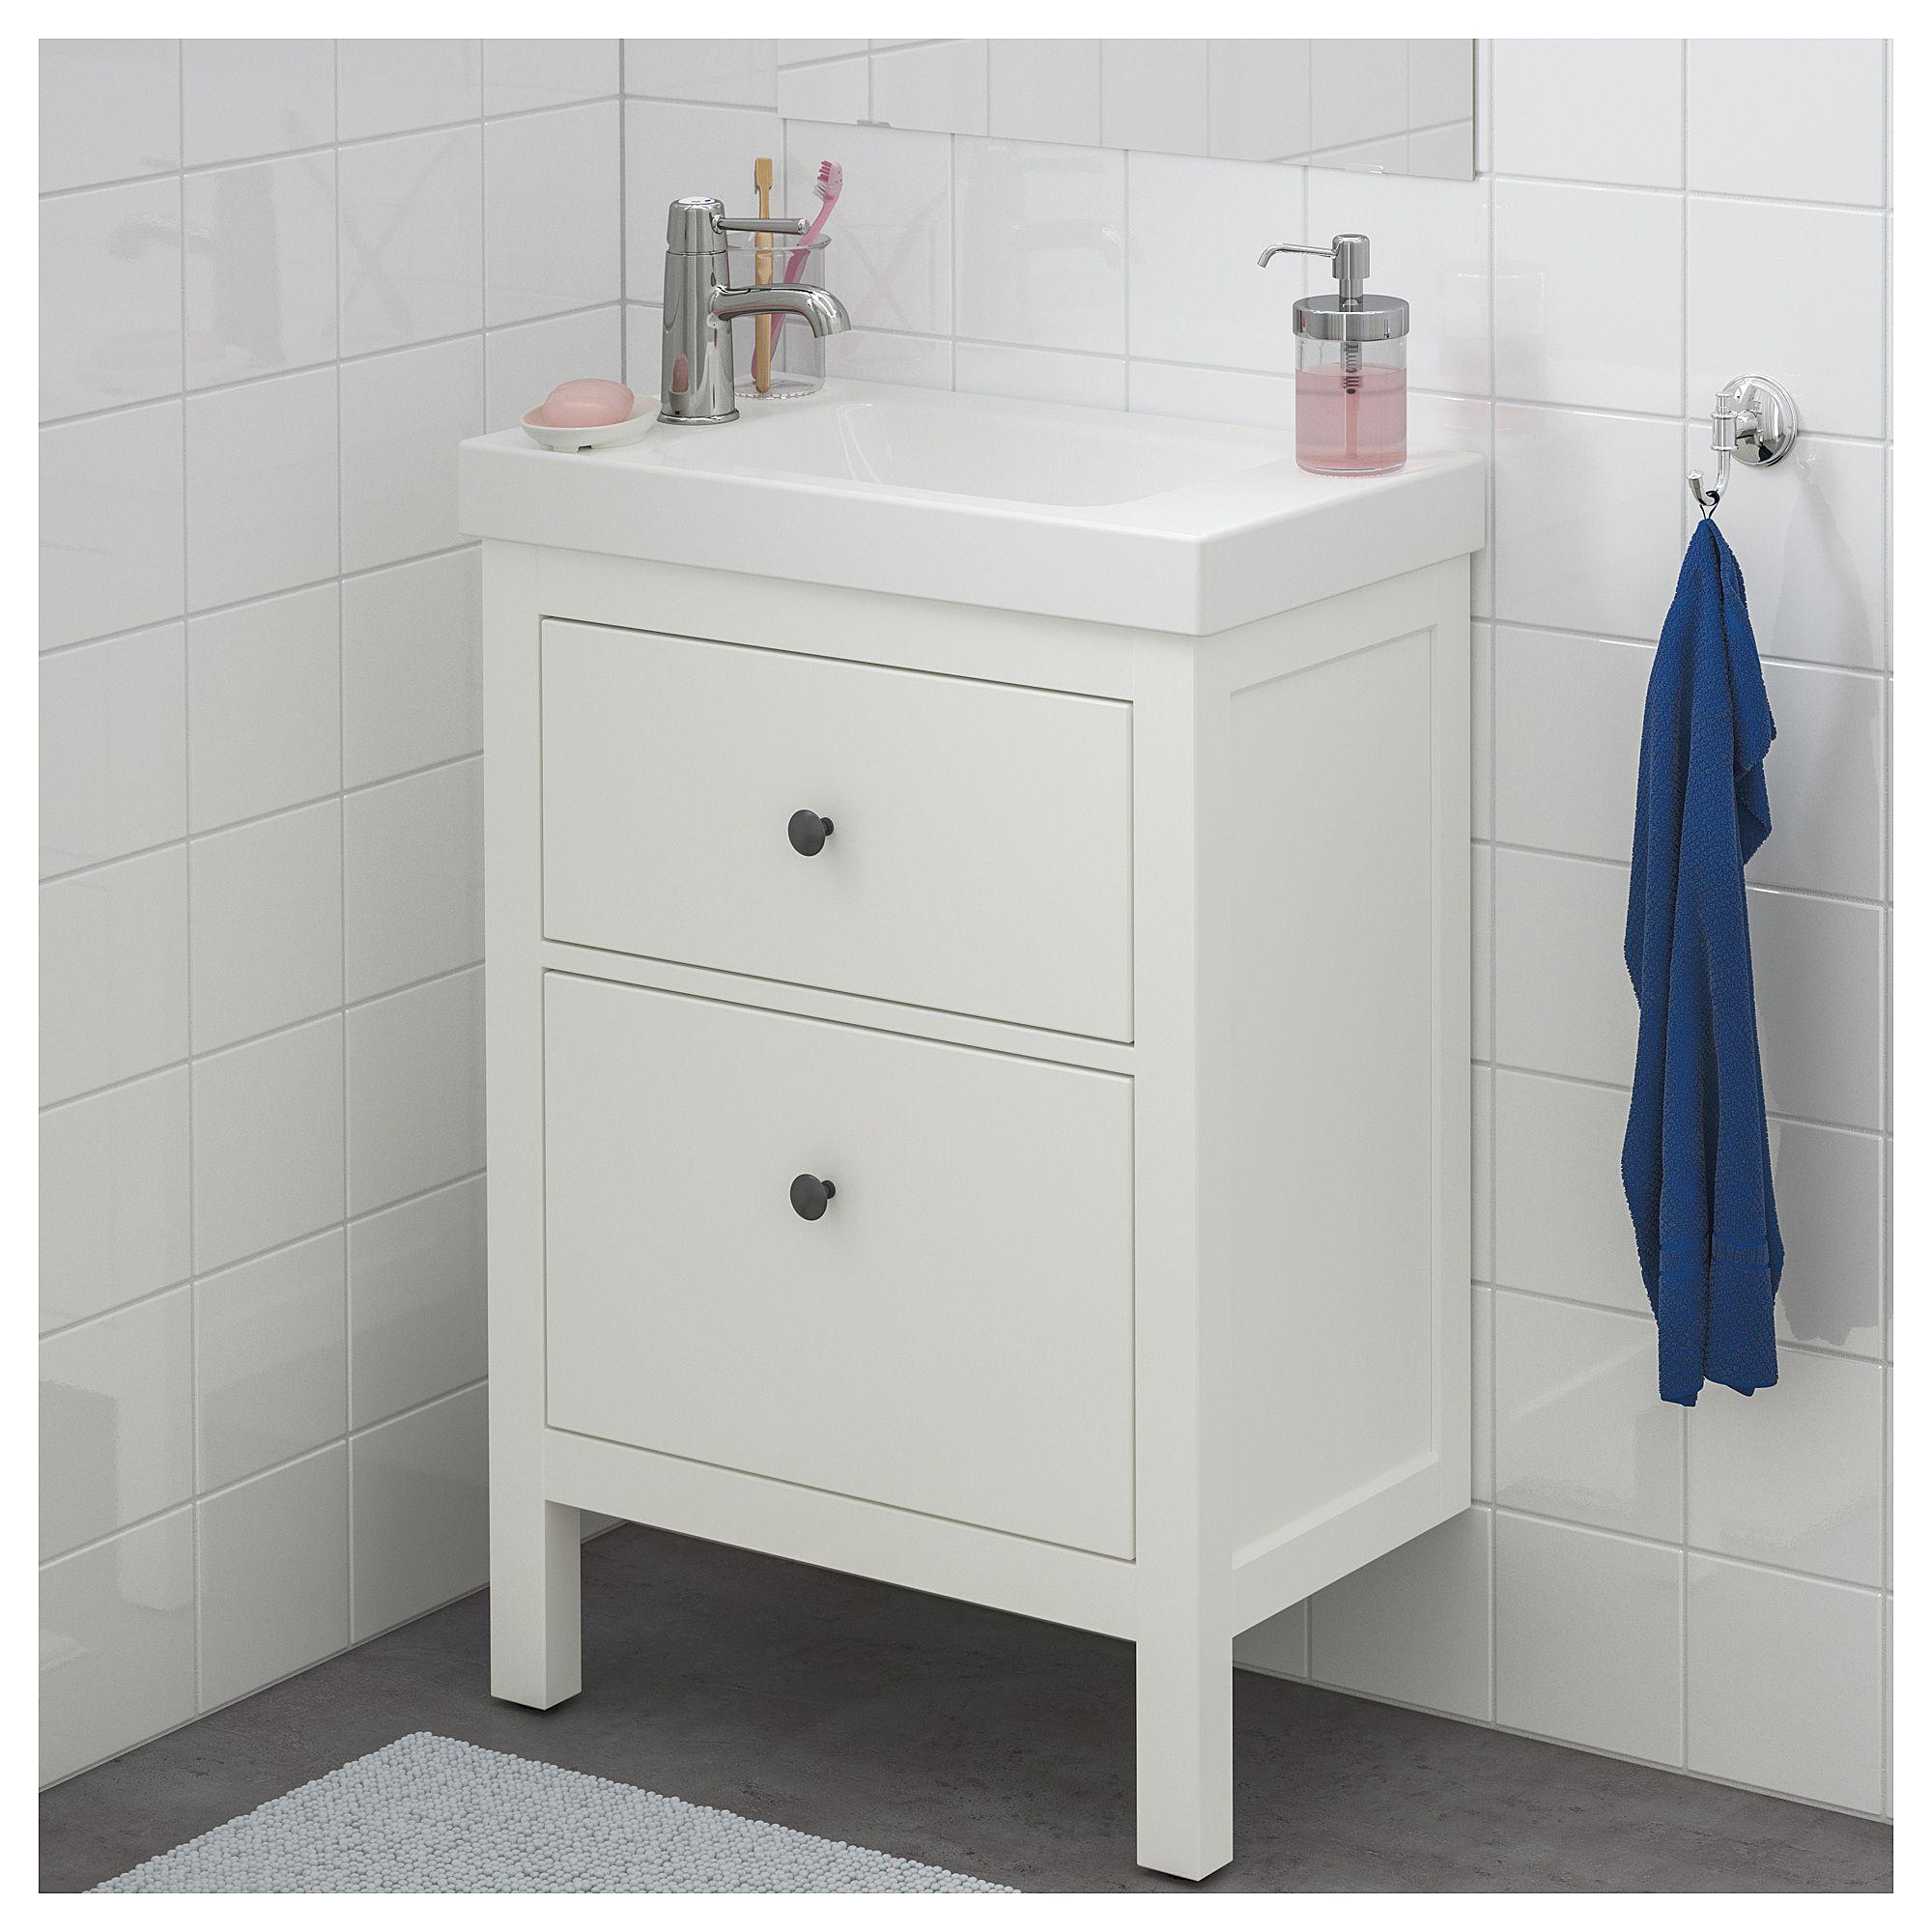 IKEA - HEMNES / HAGAVIKEN Sink cabinet with 2 drawers white ...